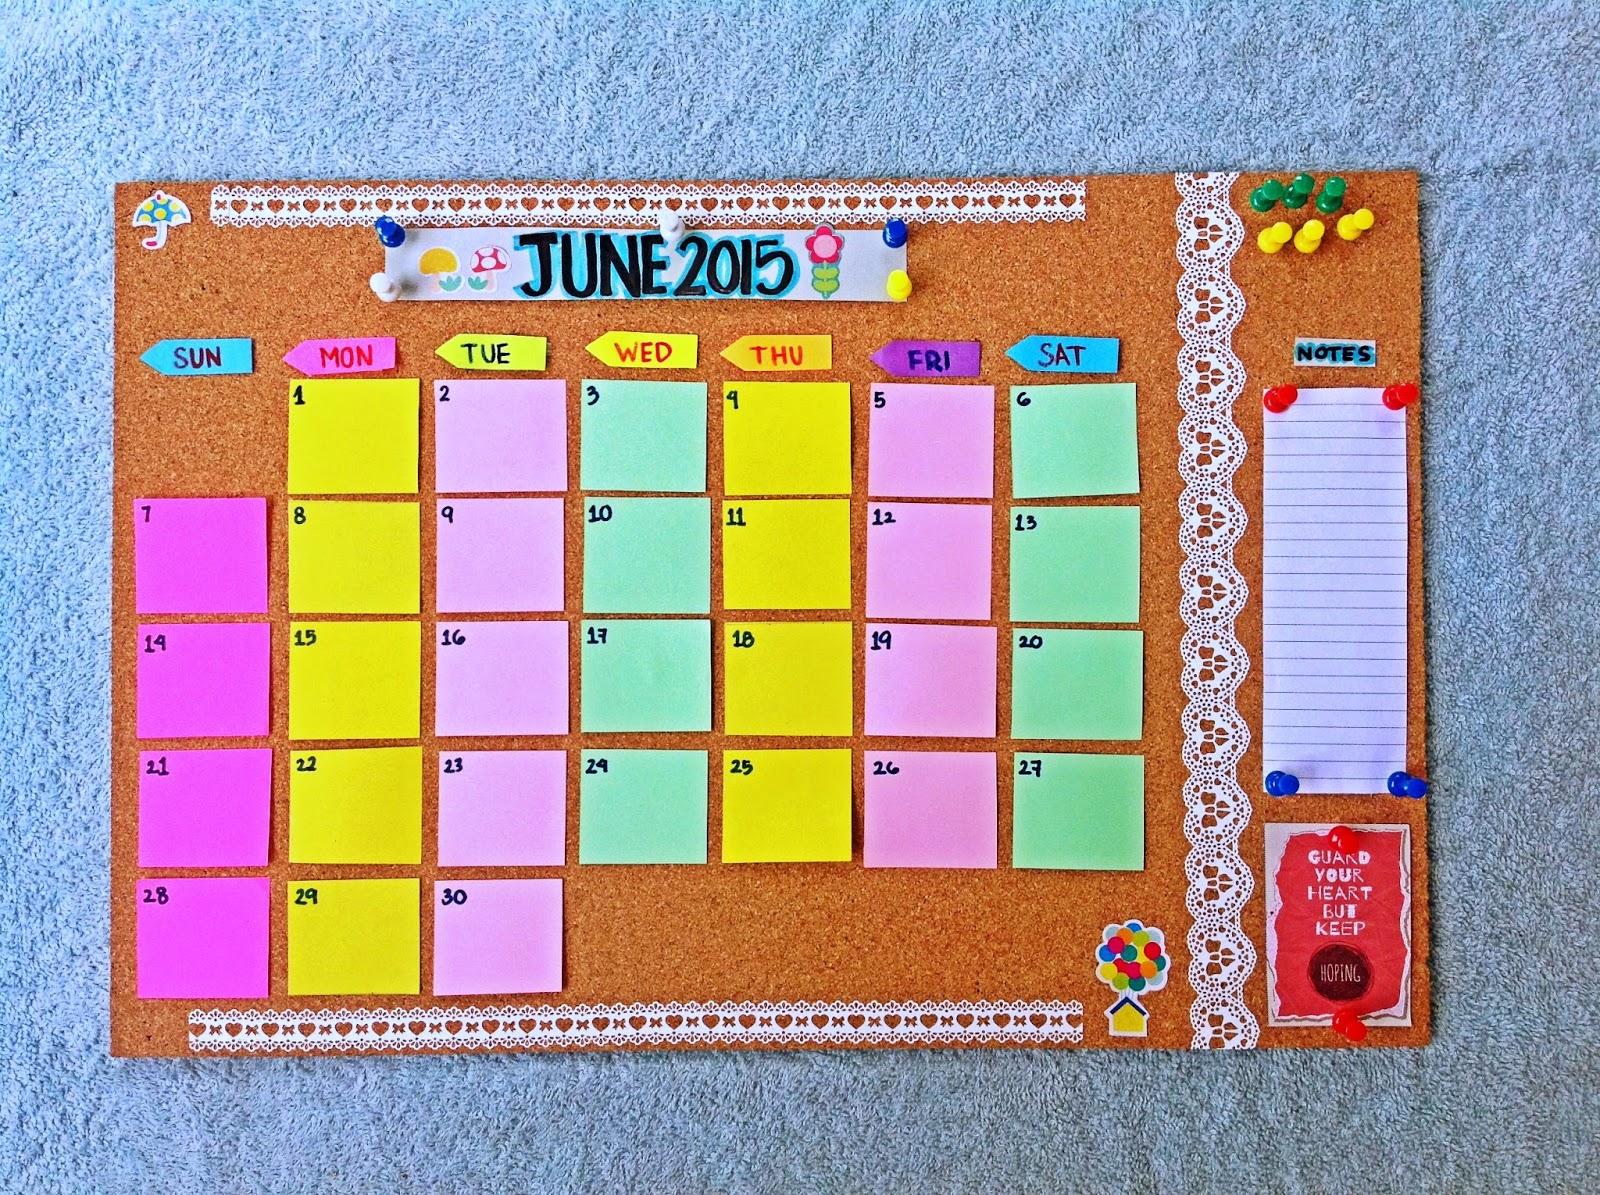 Paper Invader Diy Cork Board Calendar